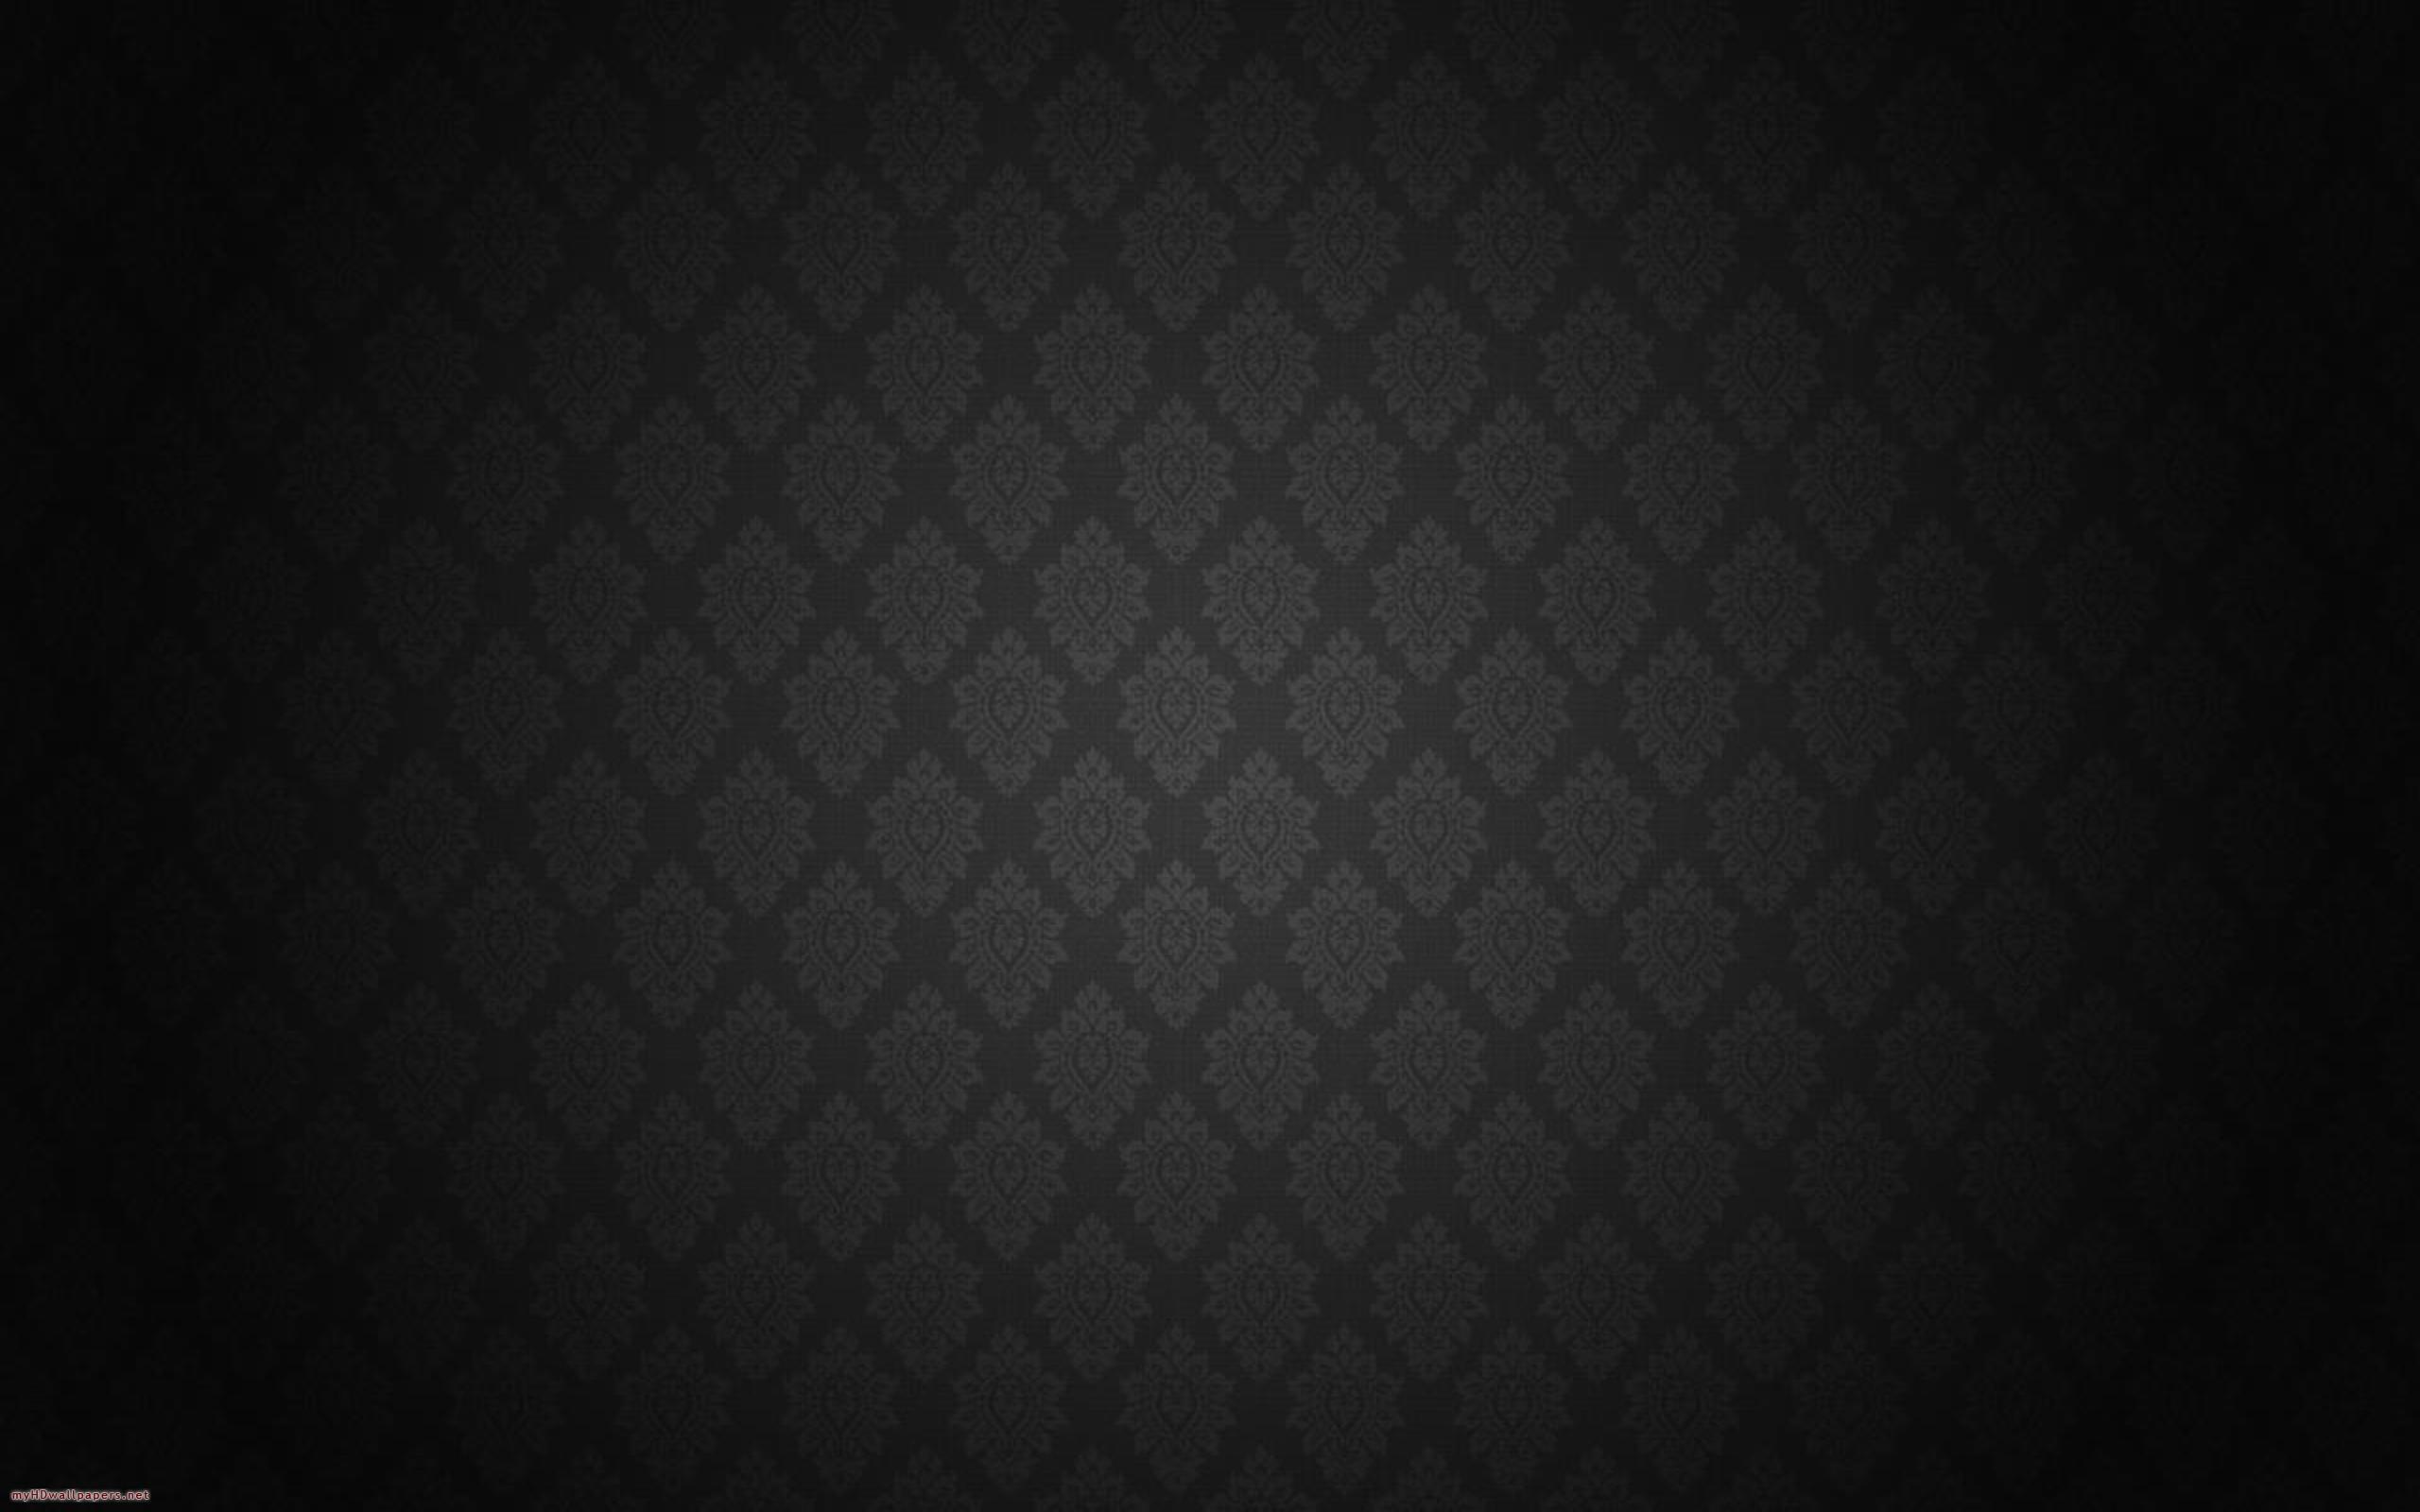 Black And Gold Wallpaper Hd 2 Hd Wallpaper